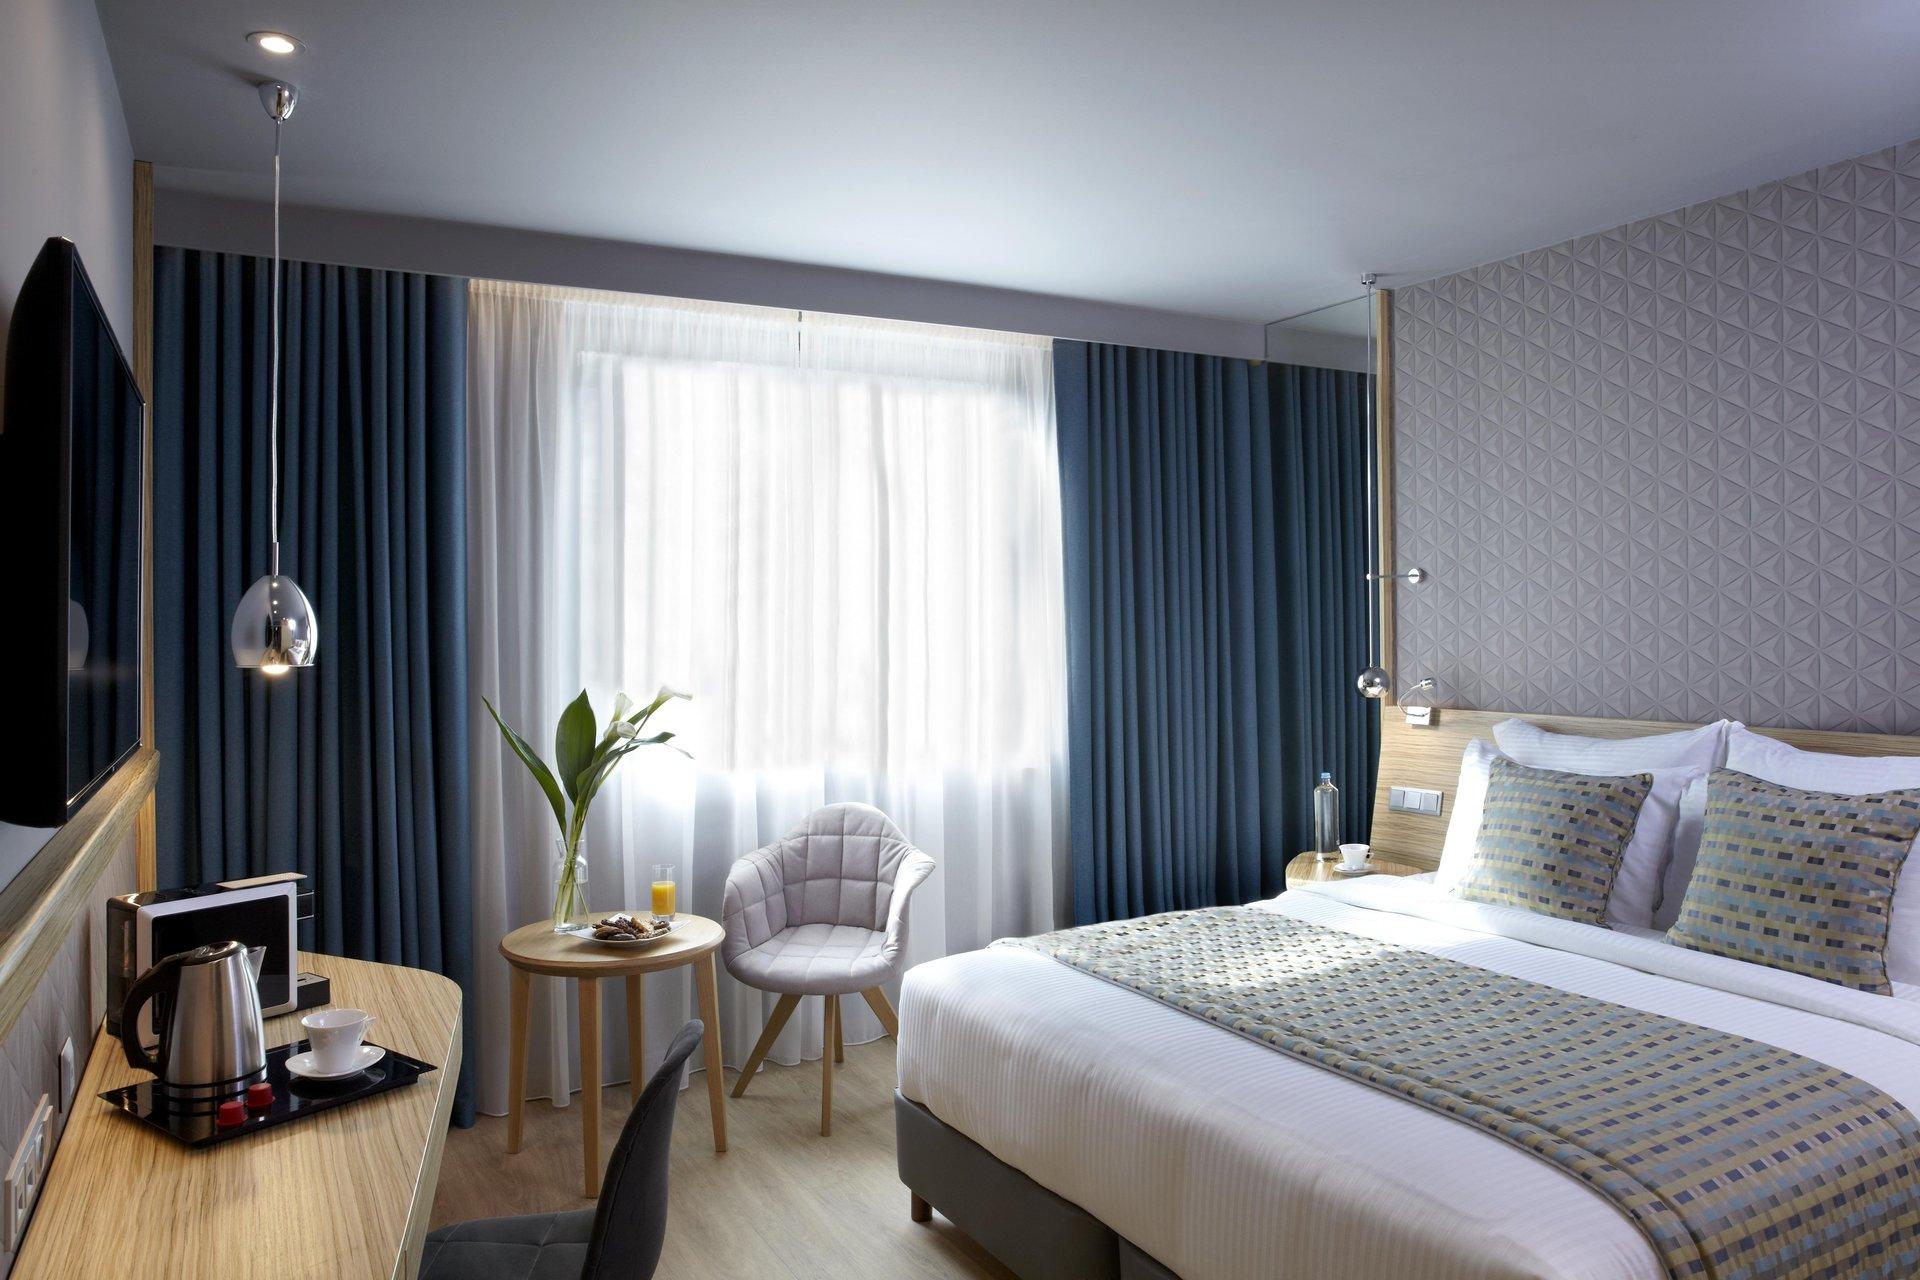 Wyndham Grand Athens Hotel - Athene